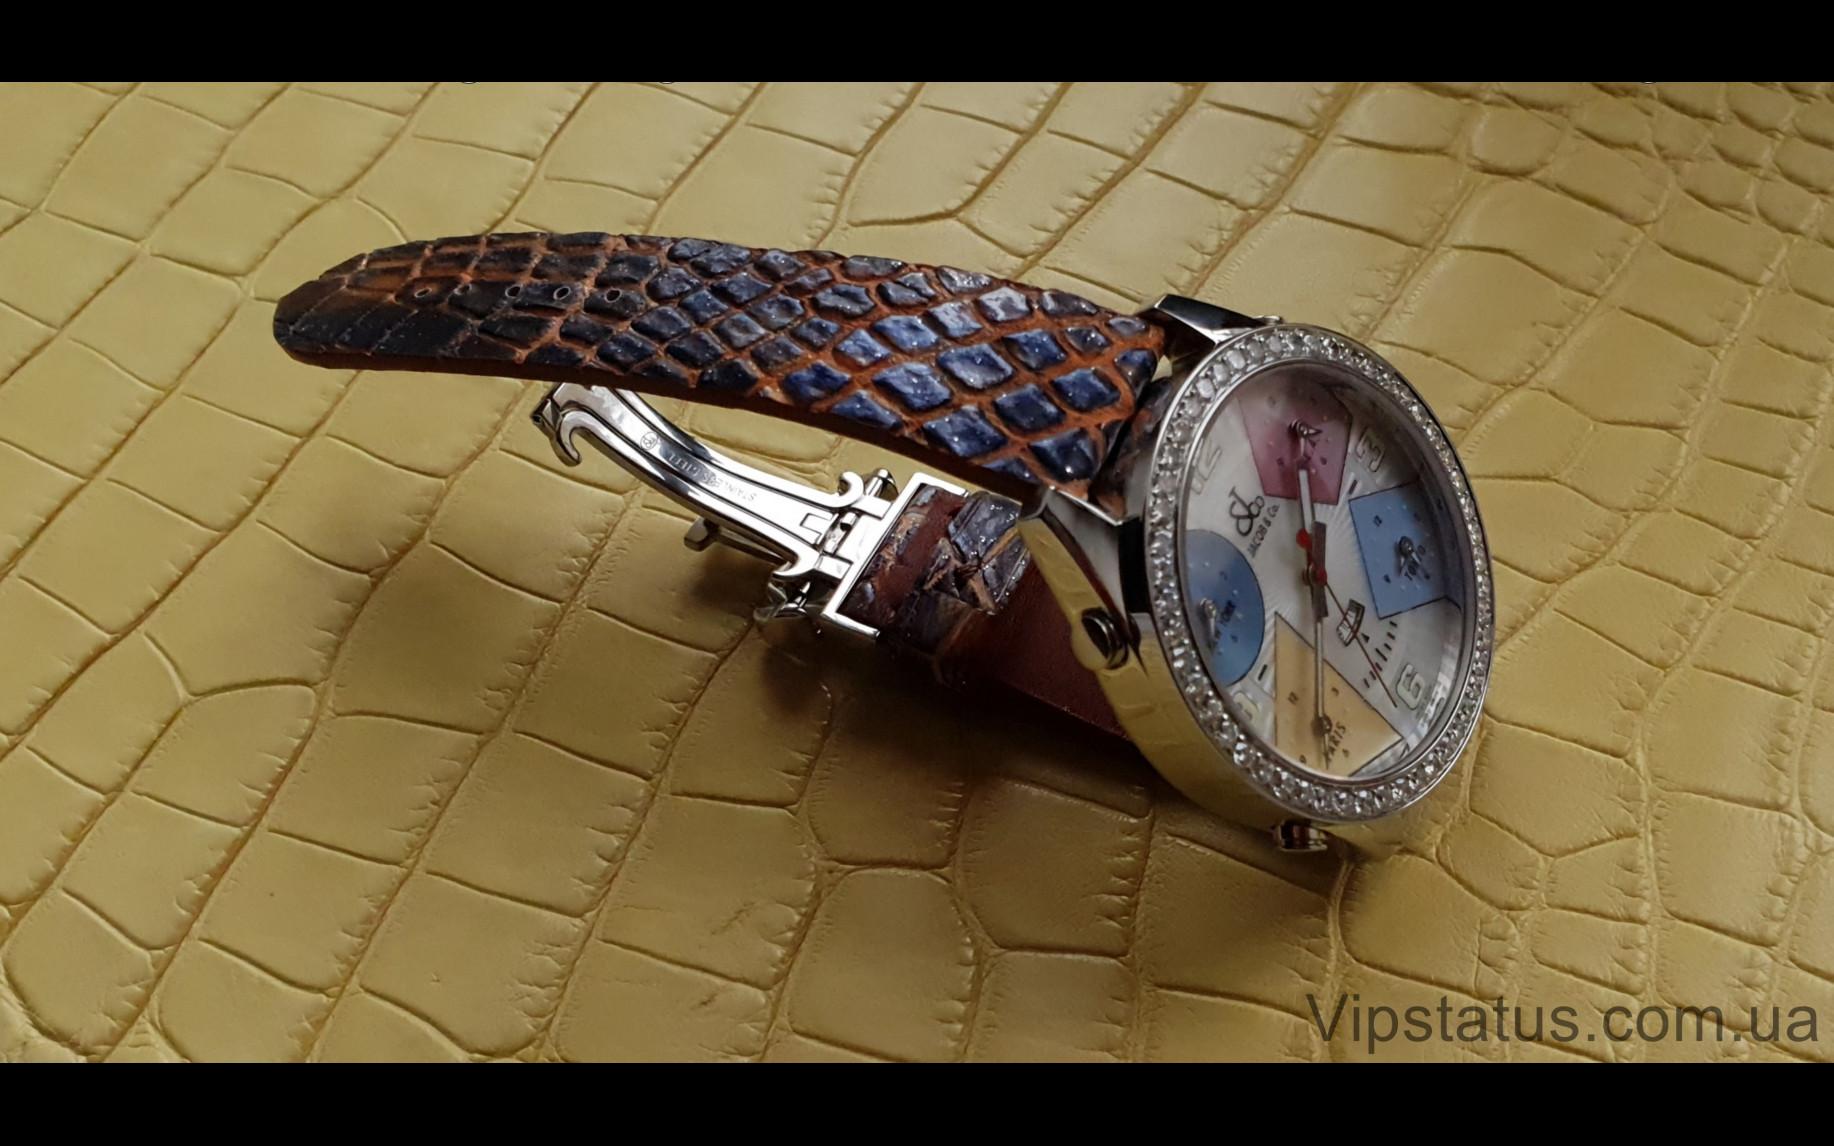 Elite Премиум ремешок для часов Jacob&Co кожа крокодила Premium Crocodile Strap for Jacob&Co watches image 6